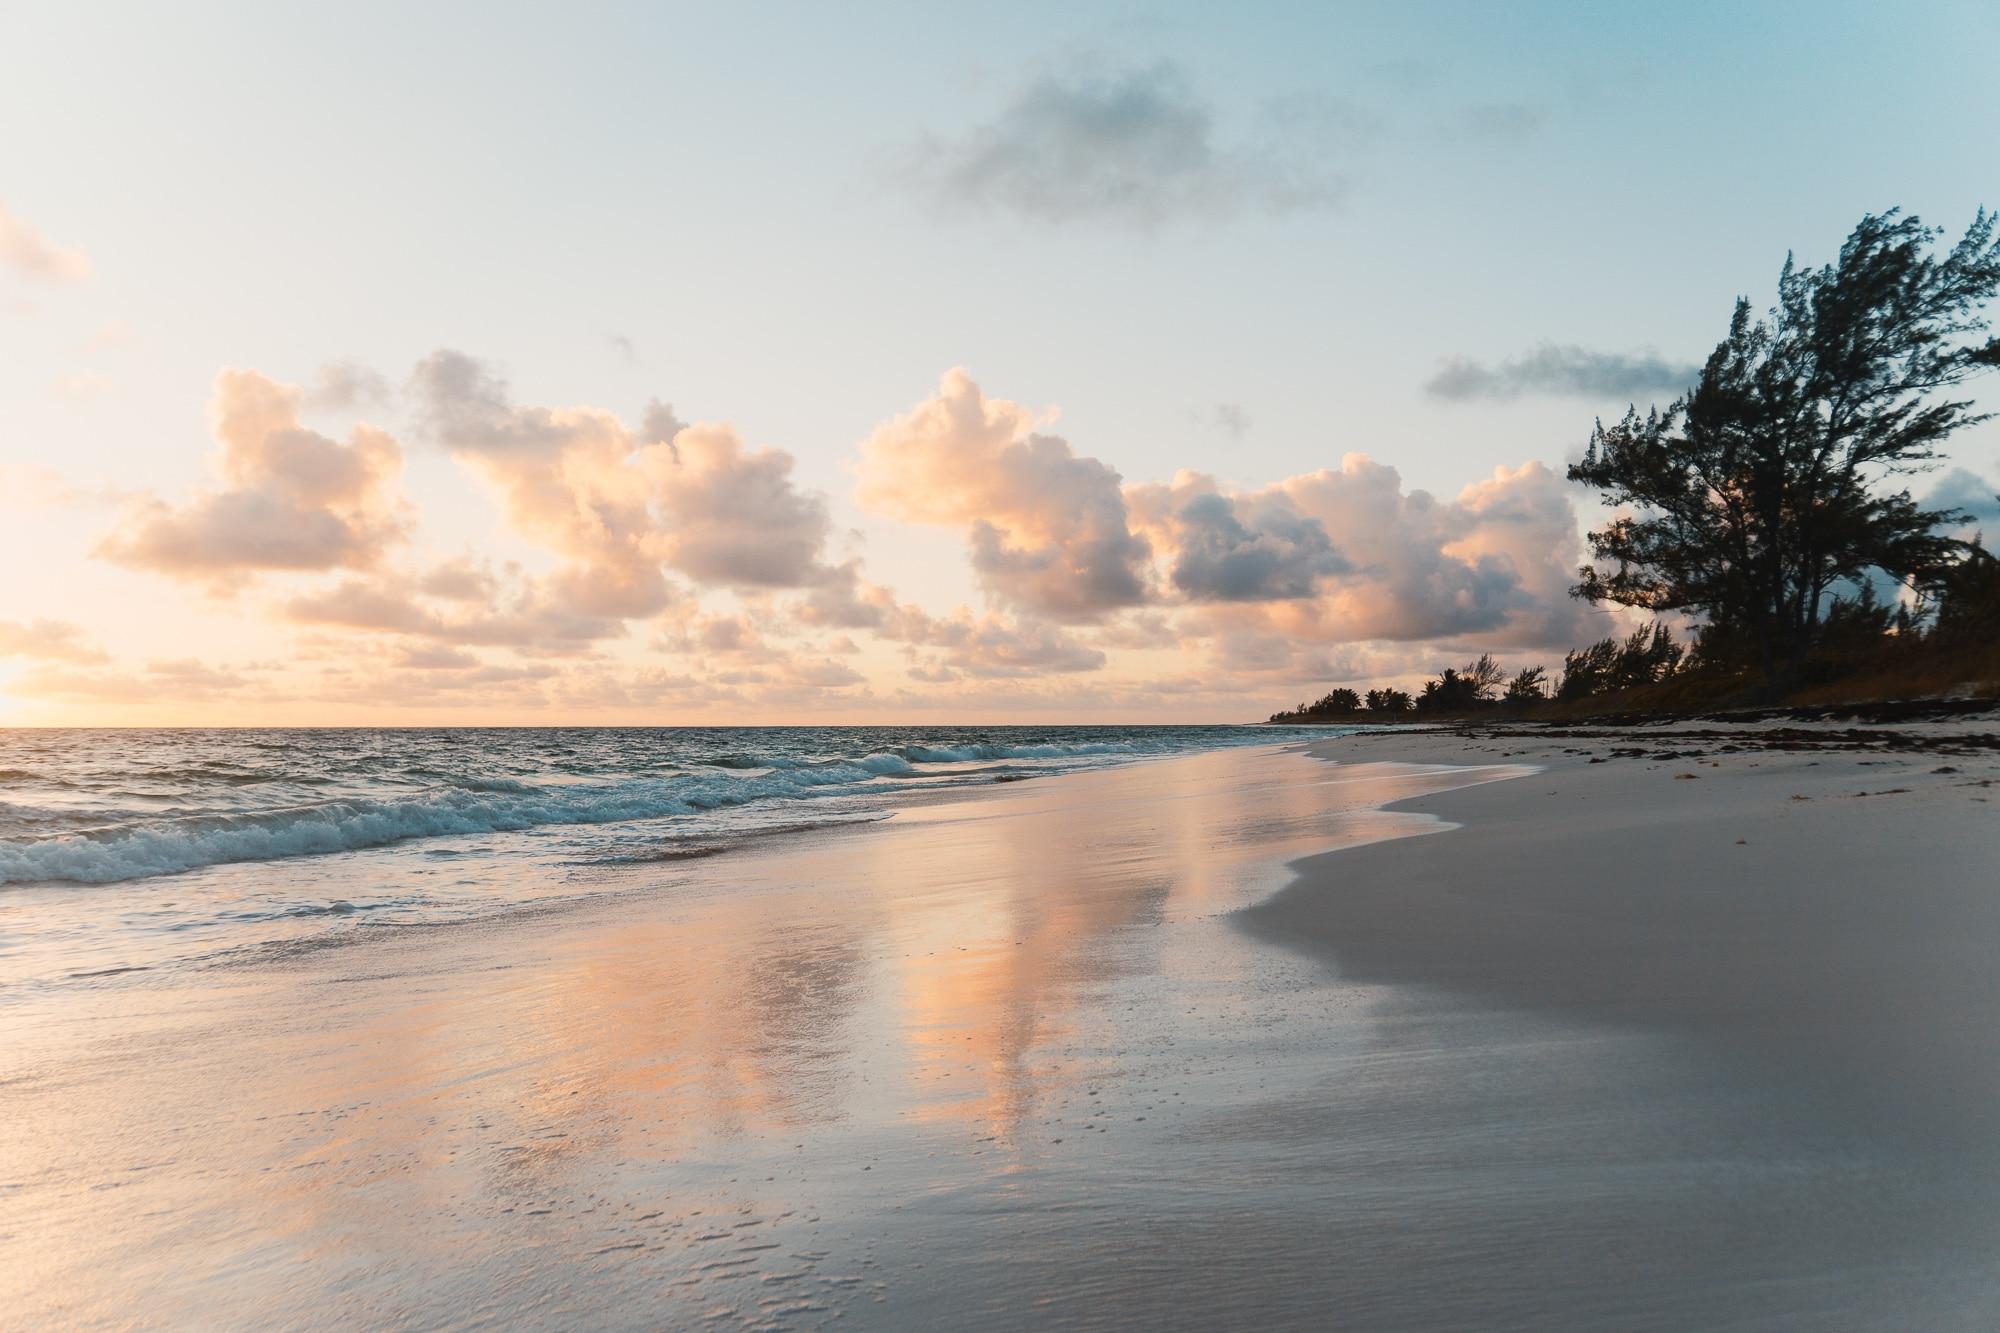 Aloha all Day every Day: Mehr Hawaii-Feeling im Alltag